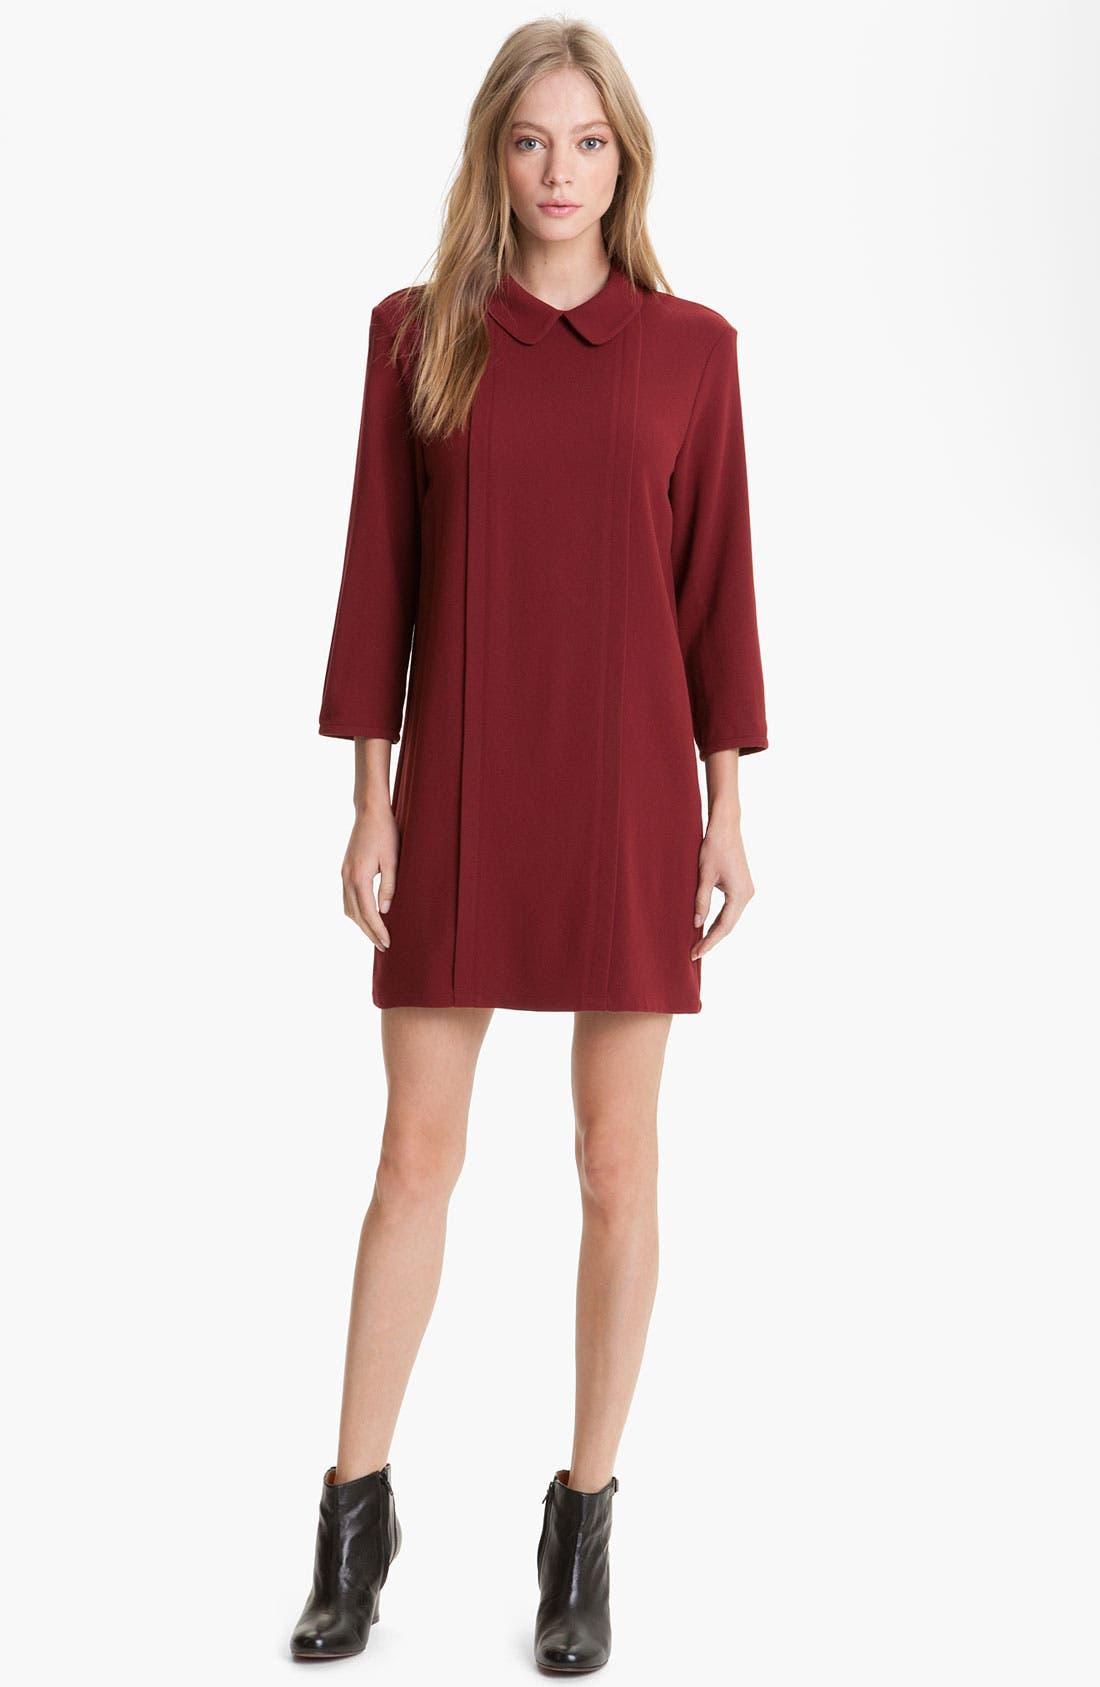 Alternate Image 1 Selected - A.P.C. Crepe Dress